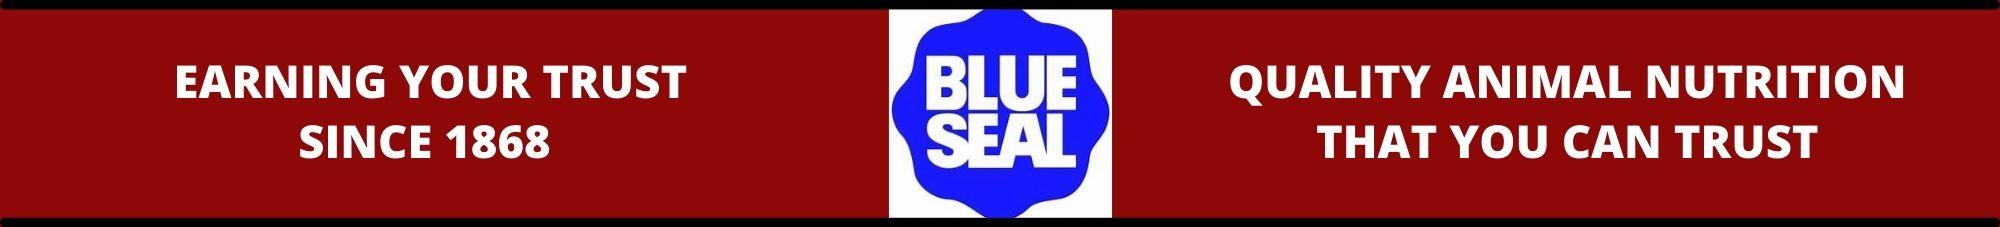 Blue Seal Banner